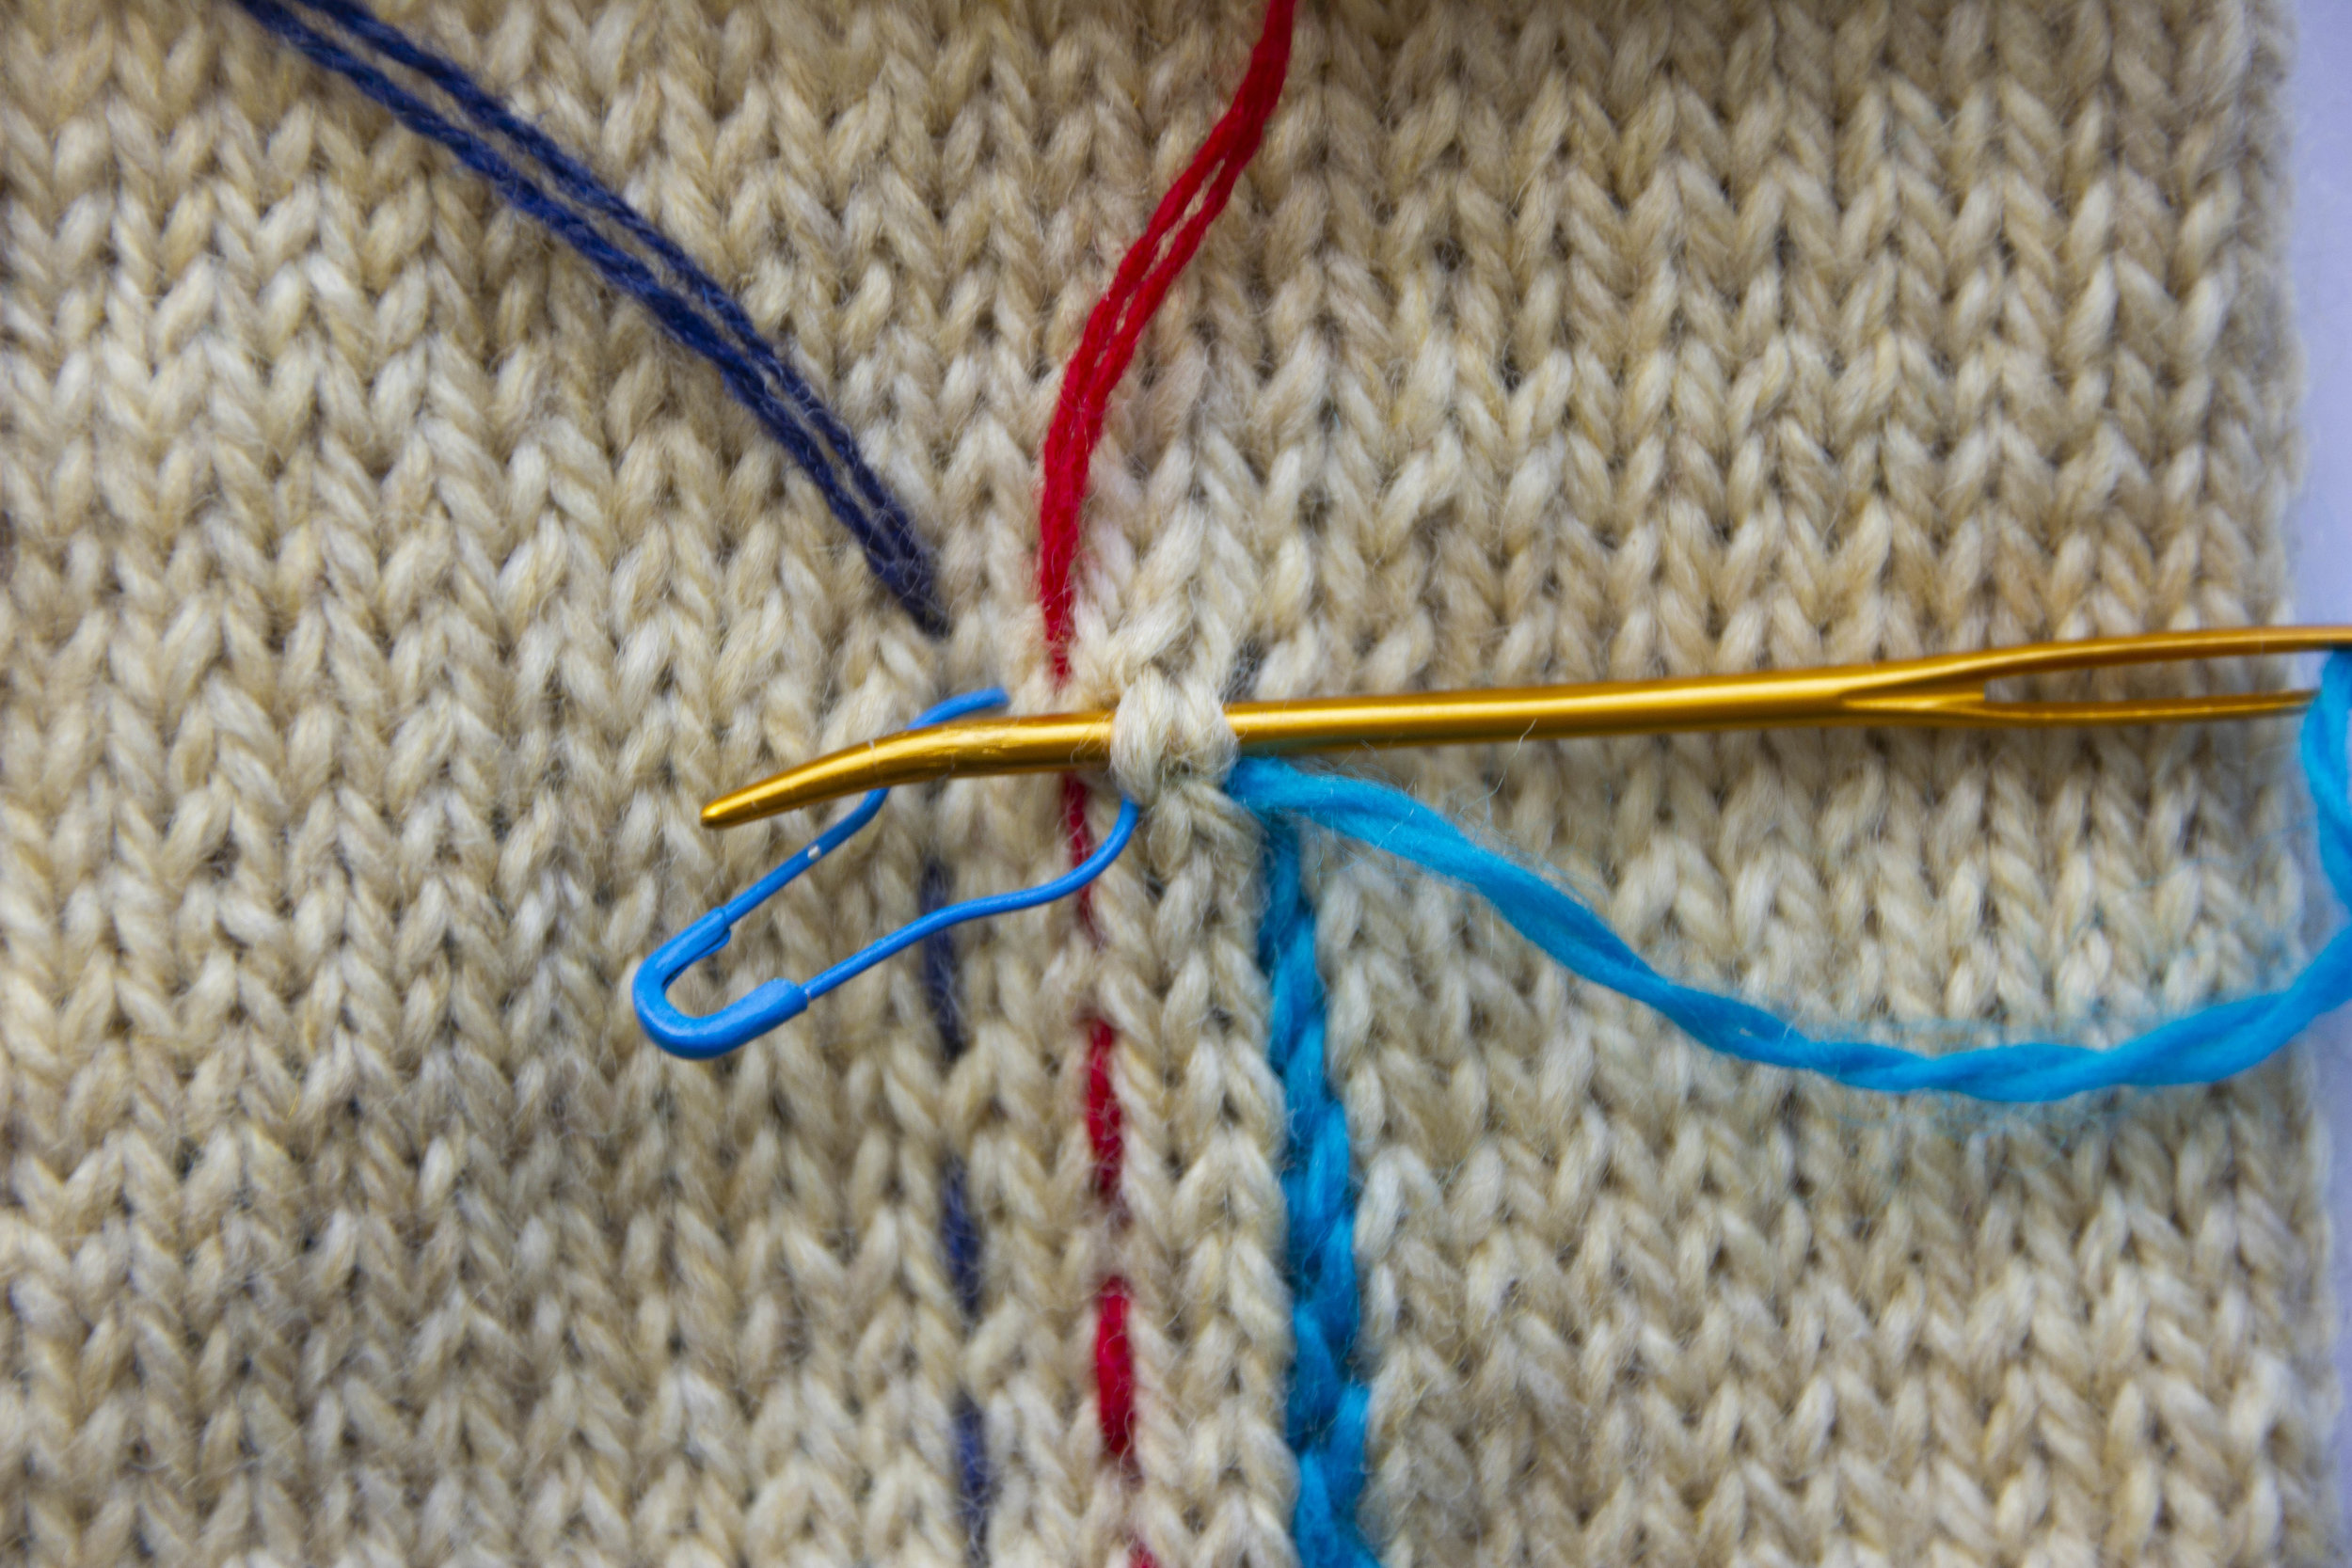 merele back stitch steek 18-2.jpg